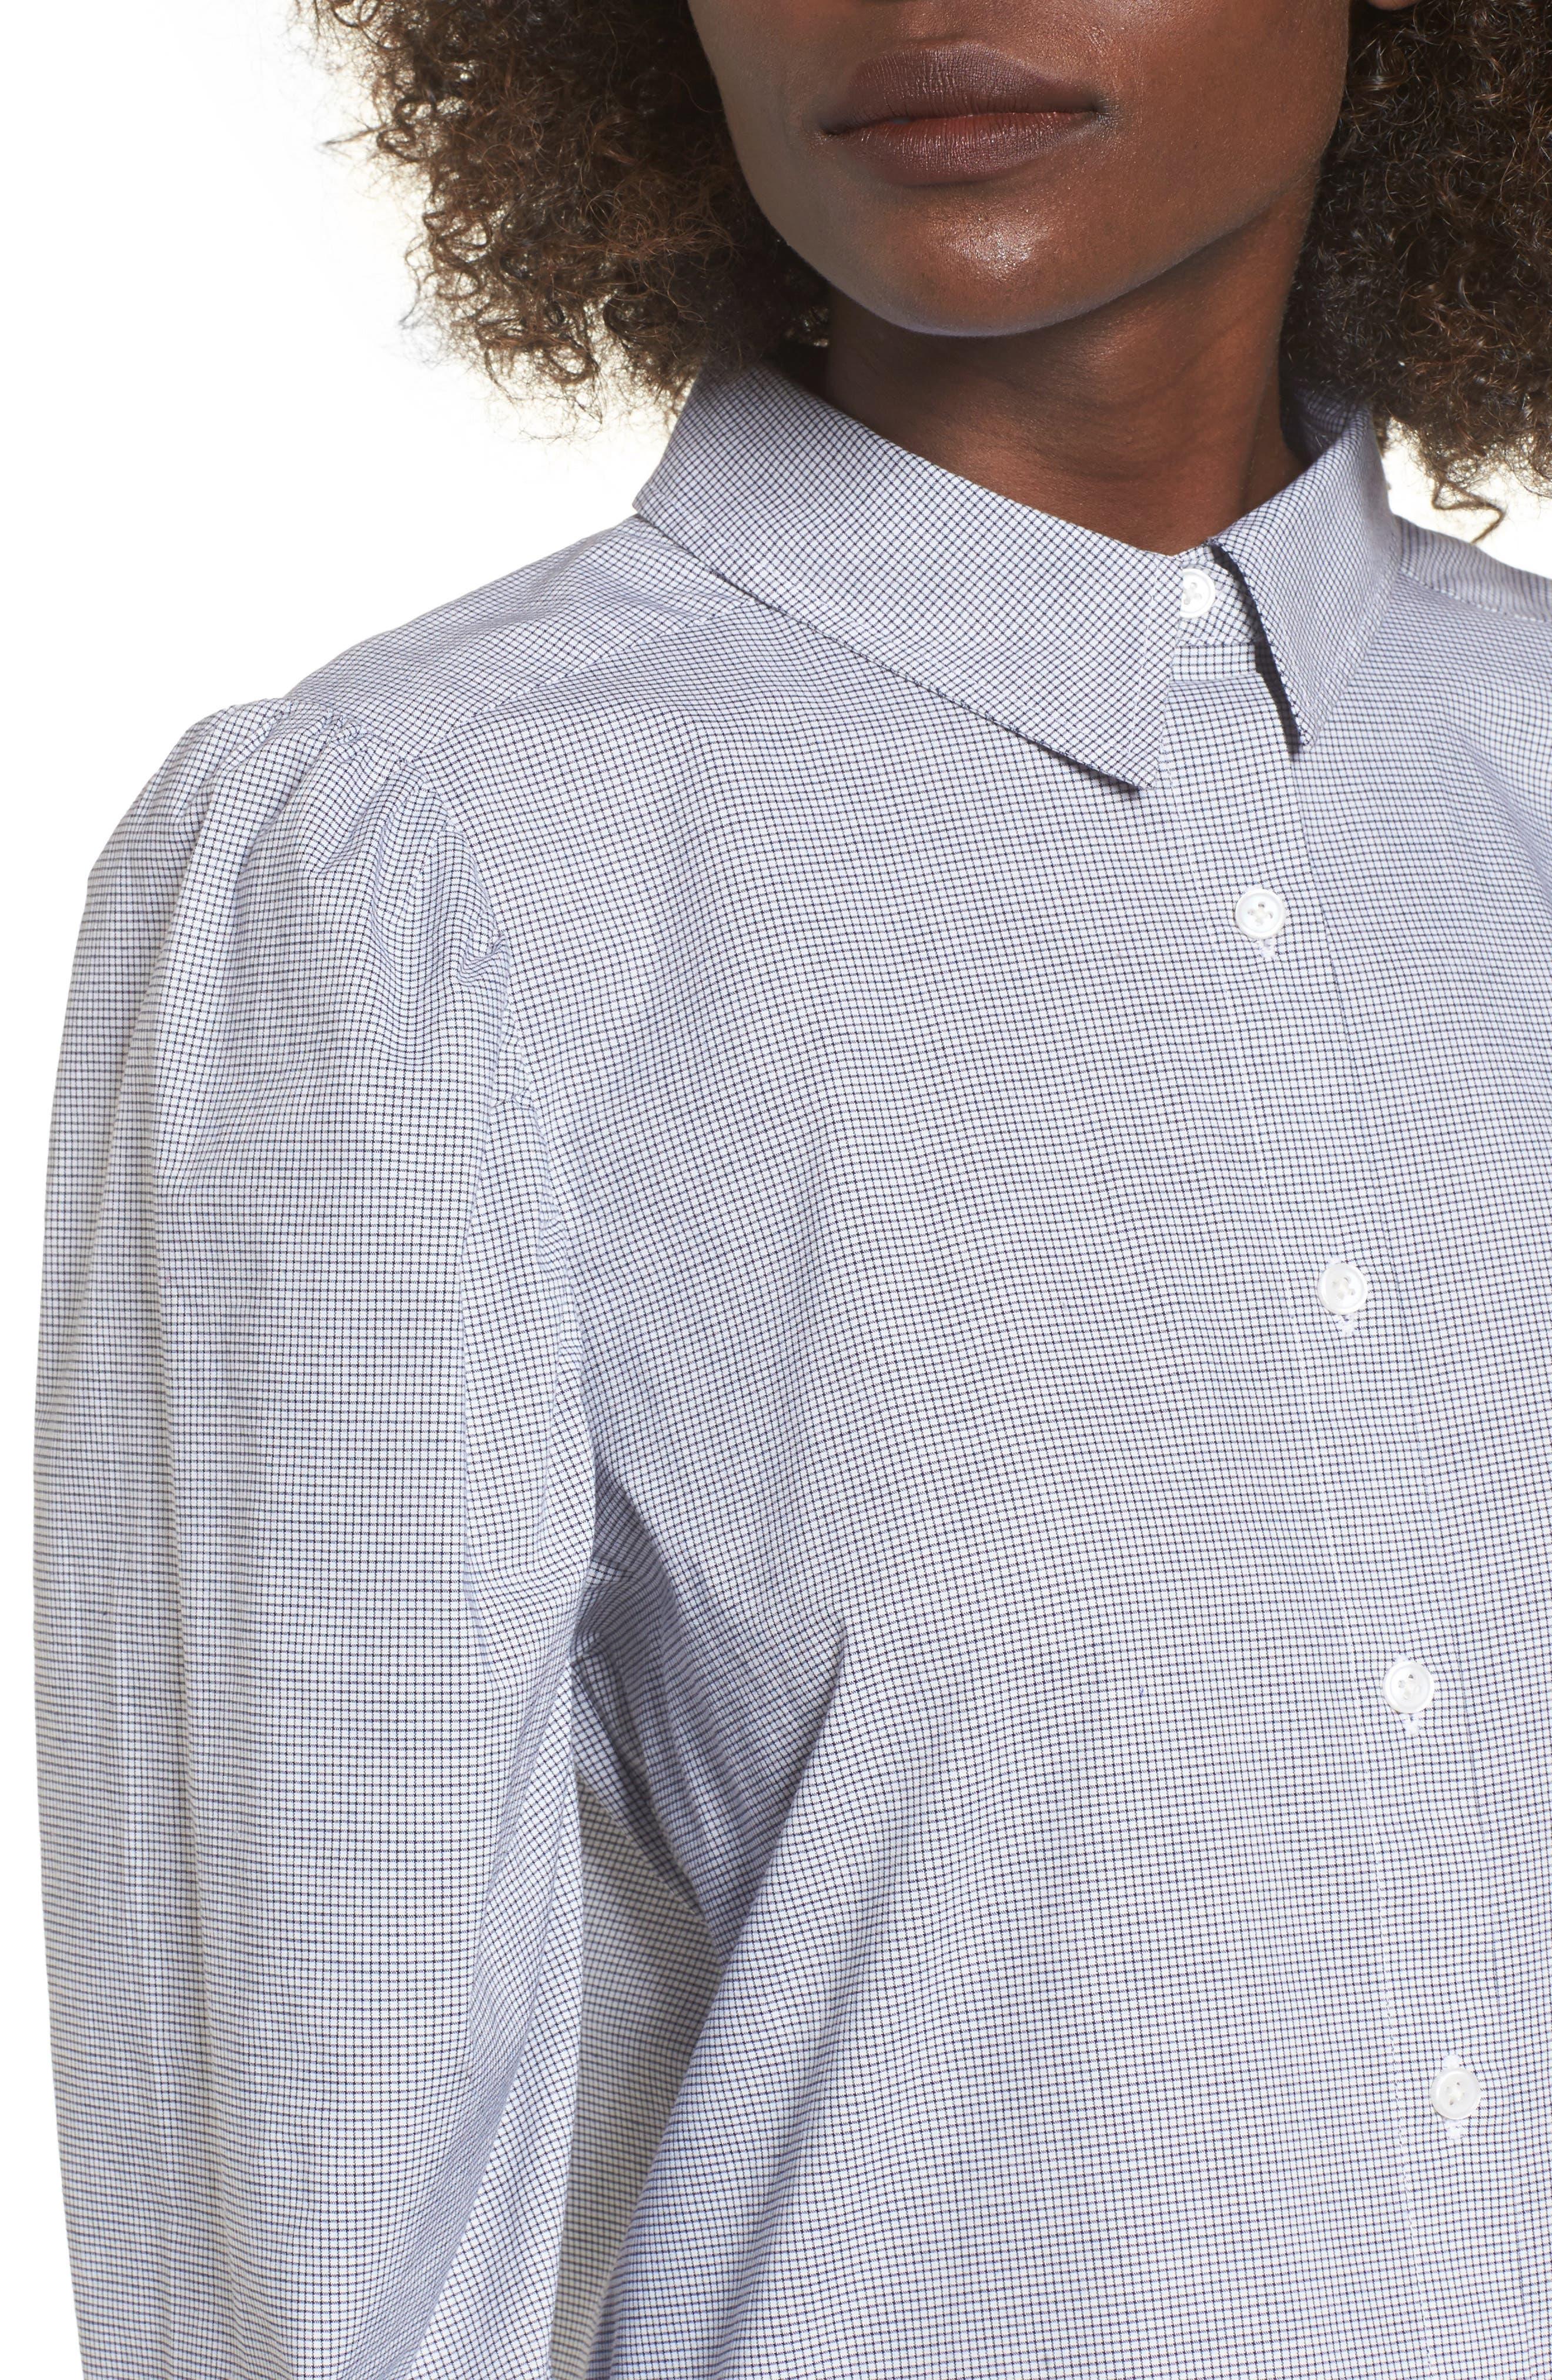 Puff Sleeve Top,                             Alternate thumbnail 4, color,                             Navy Evening Jillian Grid